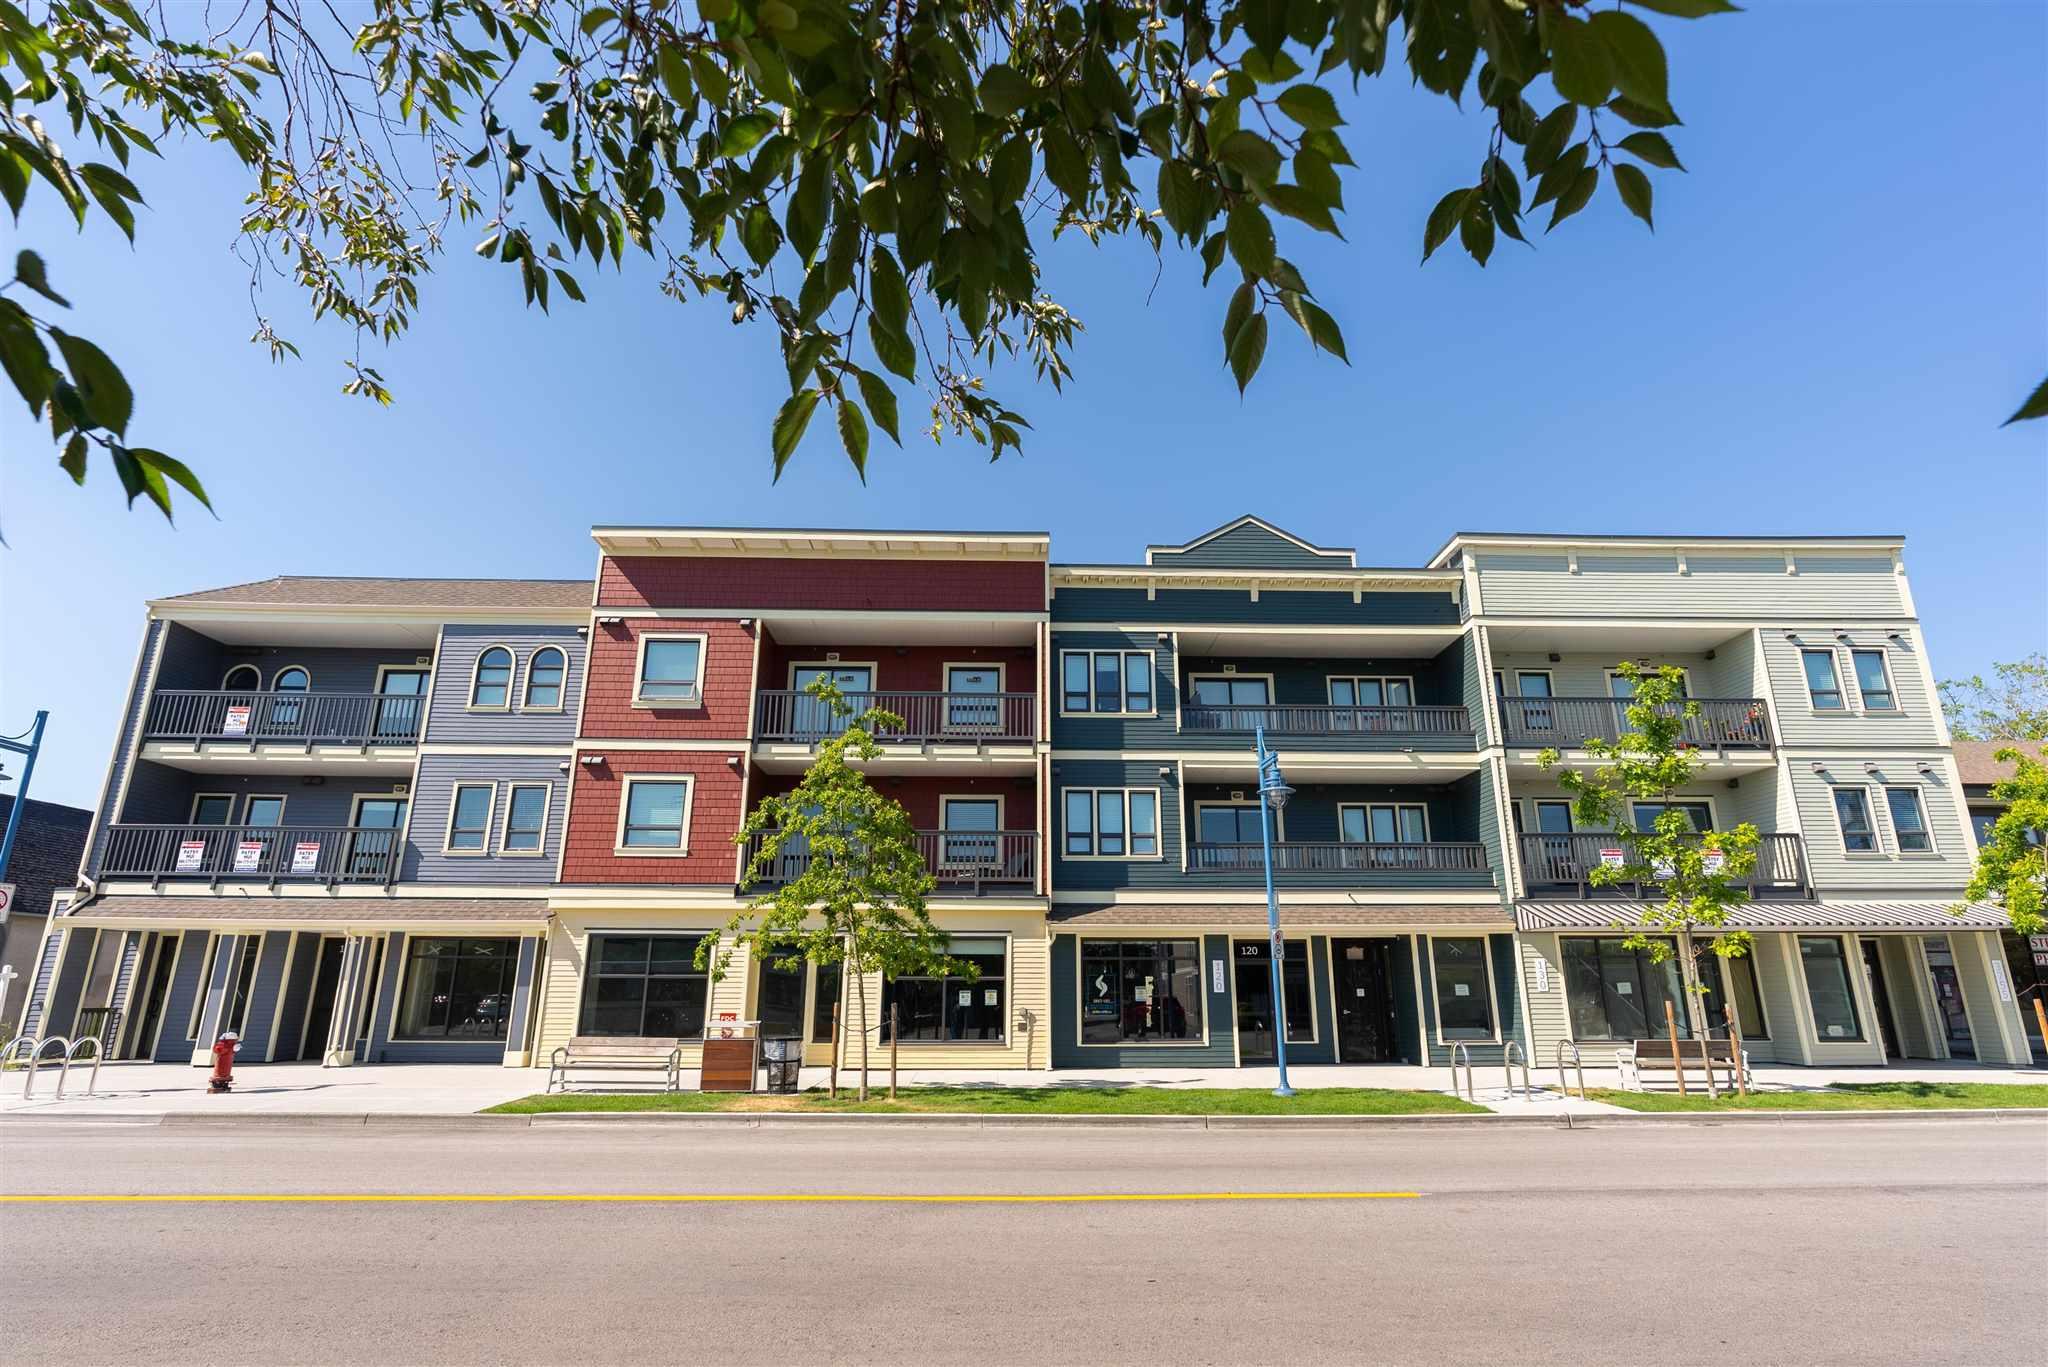 304 3755 CHATHAM STREET - Steveston Village Apartment/Condo for sale, 3 Bedrooms (R2600147)